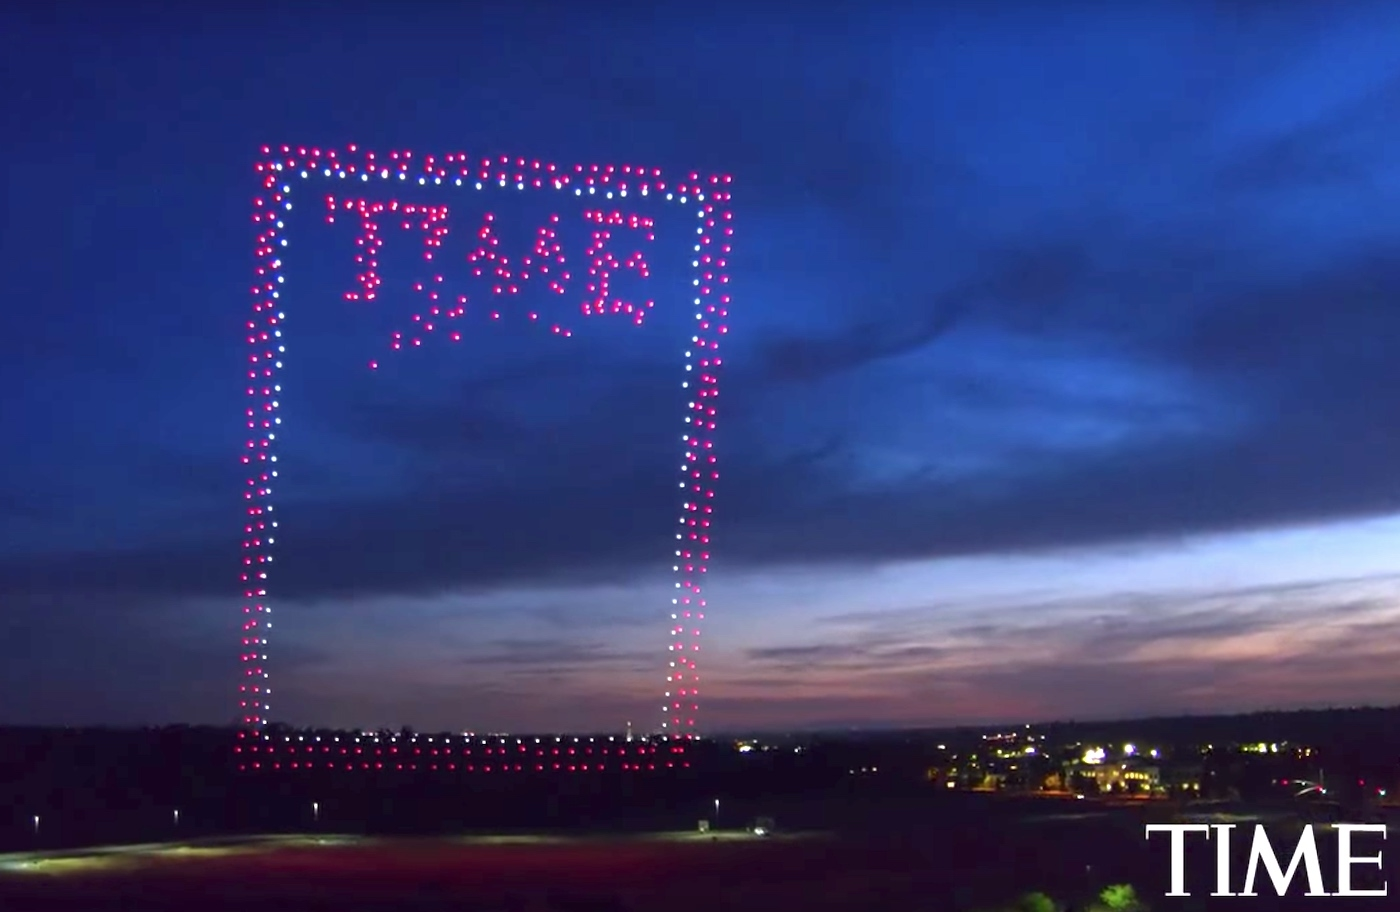 time cr u00e9e sa derni u00e8re couverture avec plus de 900 drones